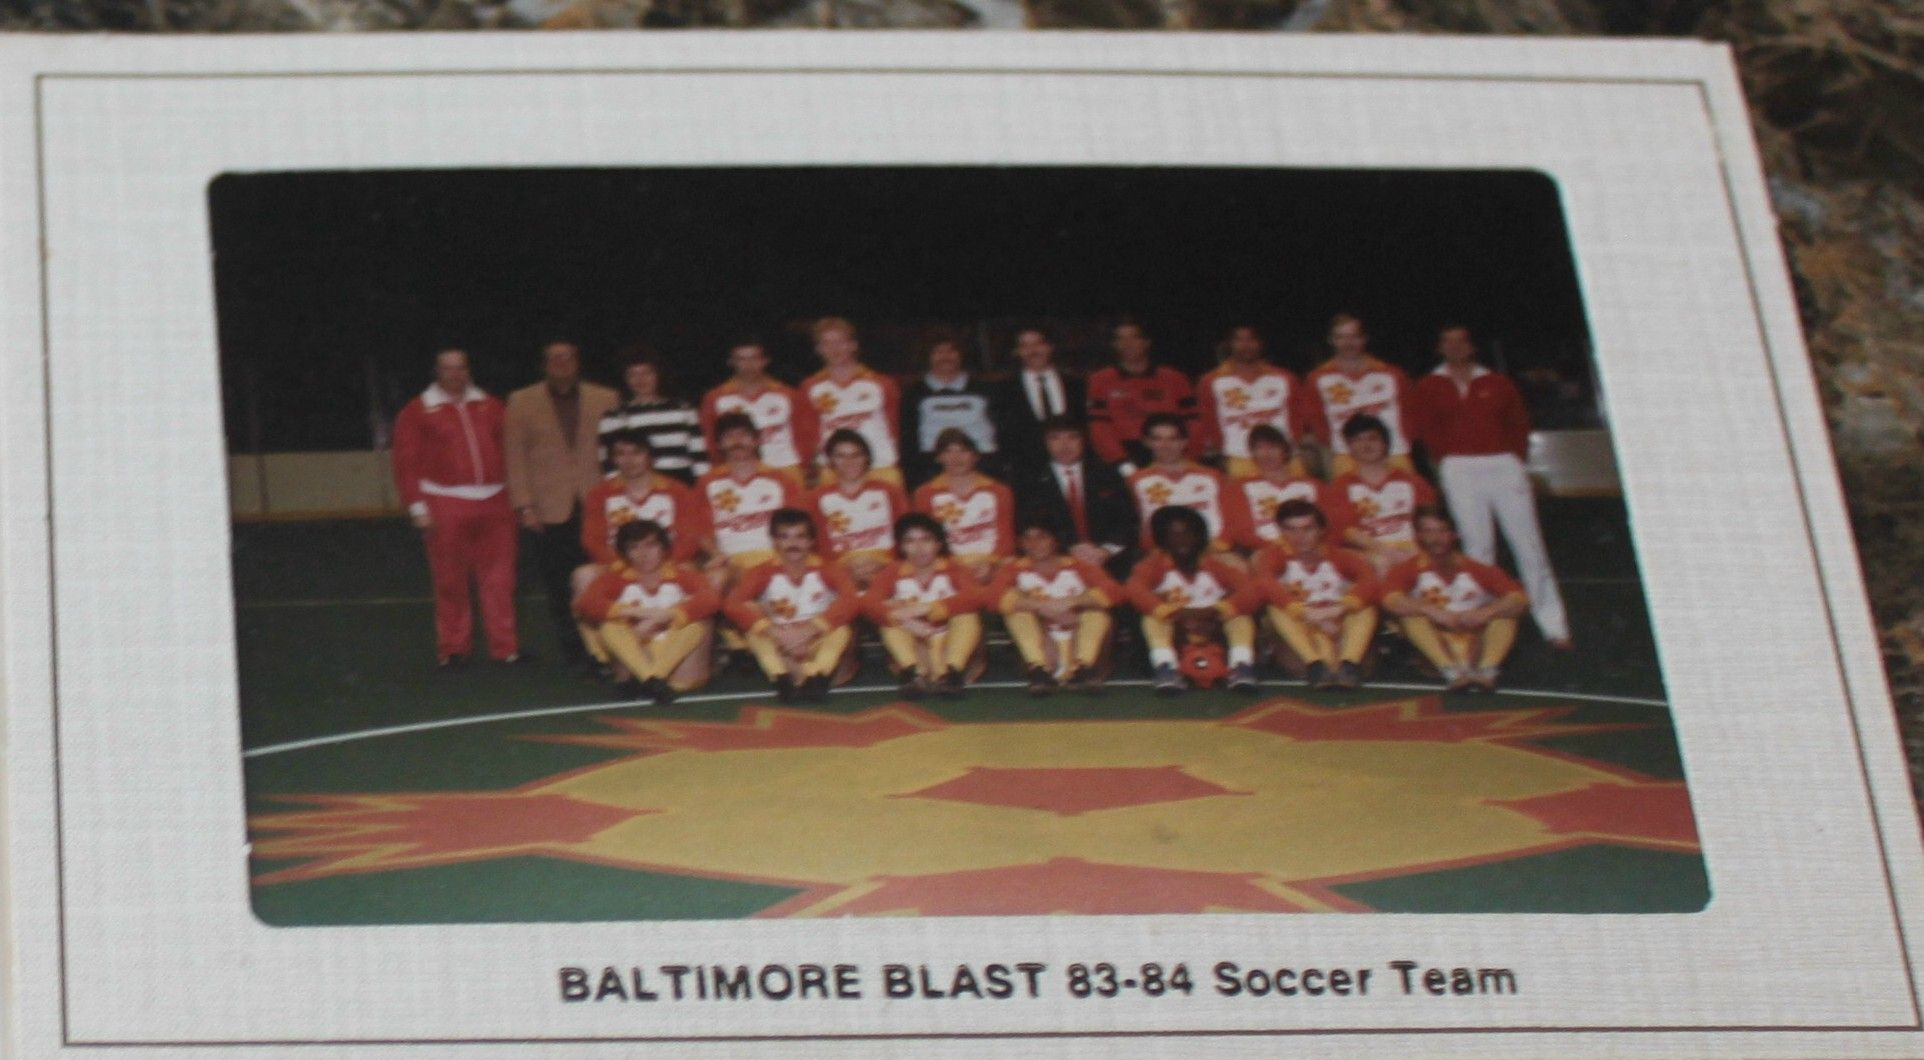 1983-84 Baltimore Blast Team photo